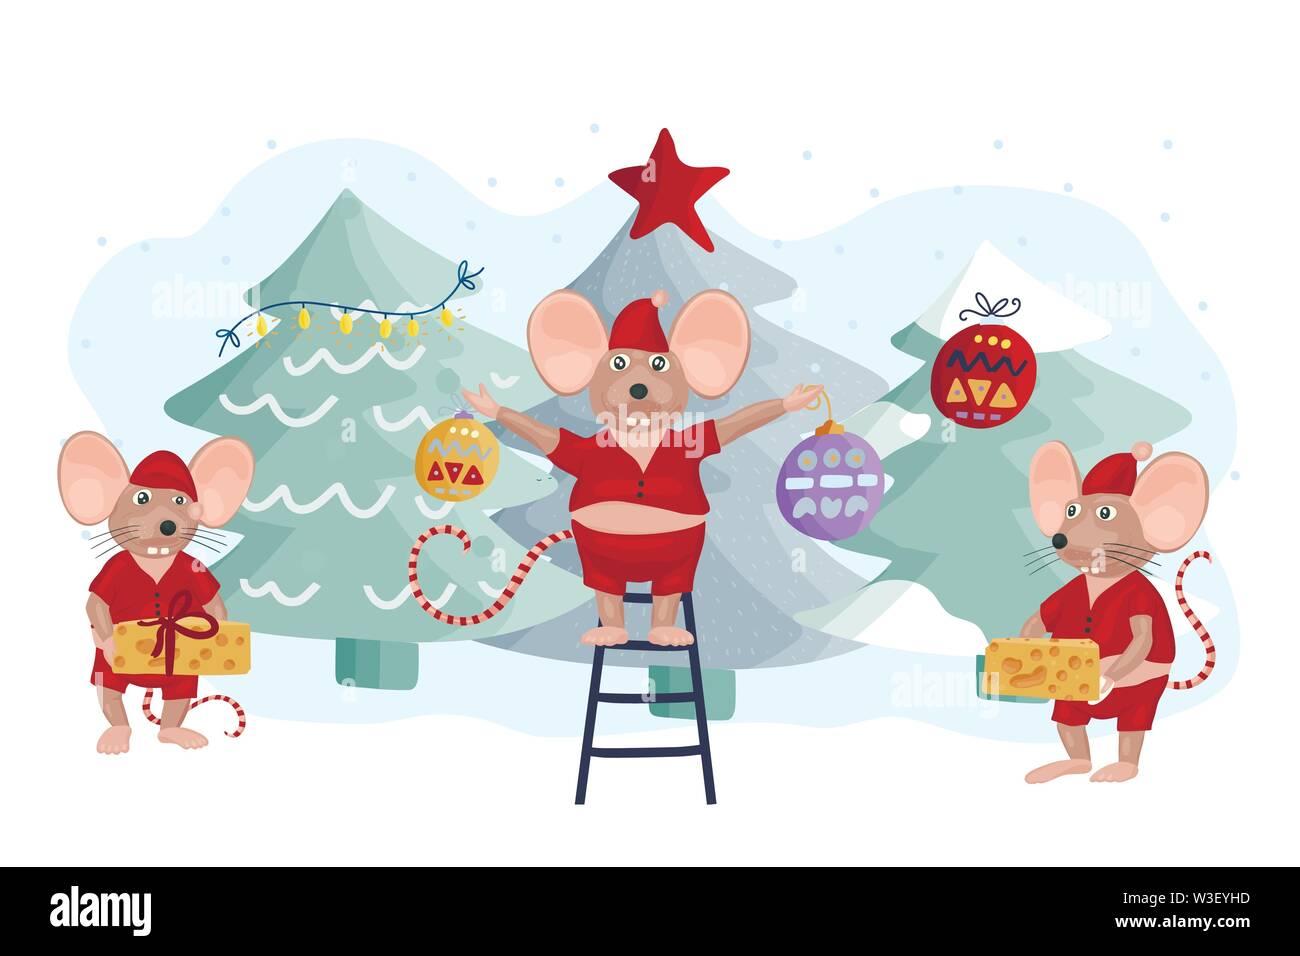 Christmas vector mouse. Cartoon illustration. - Stock Image